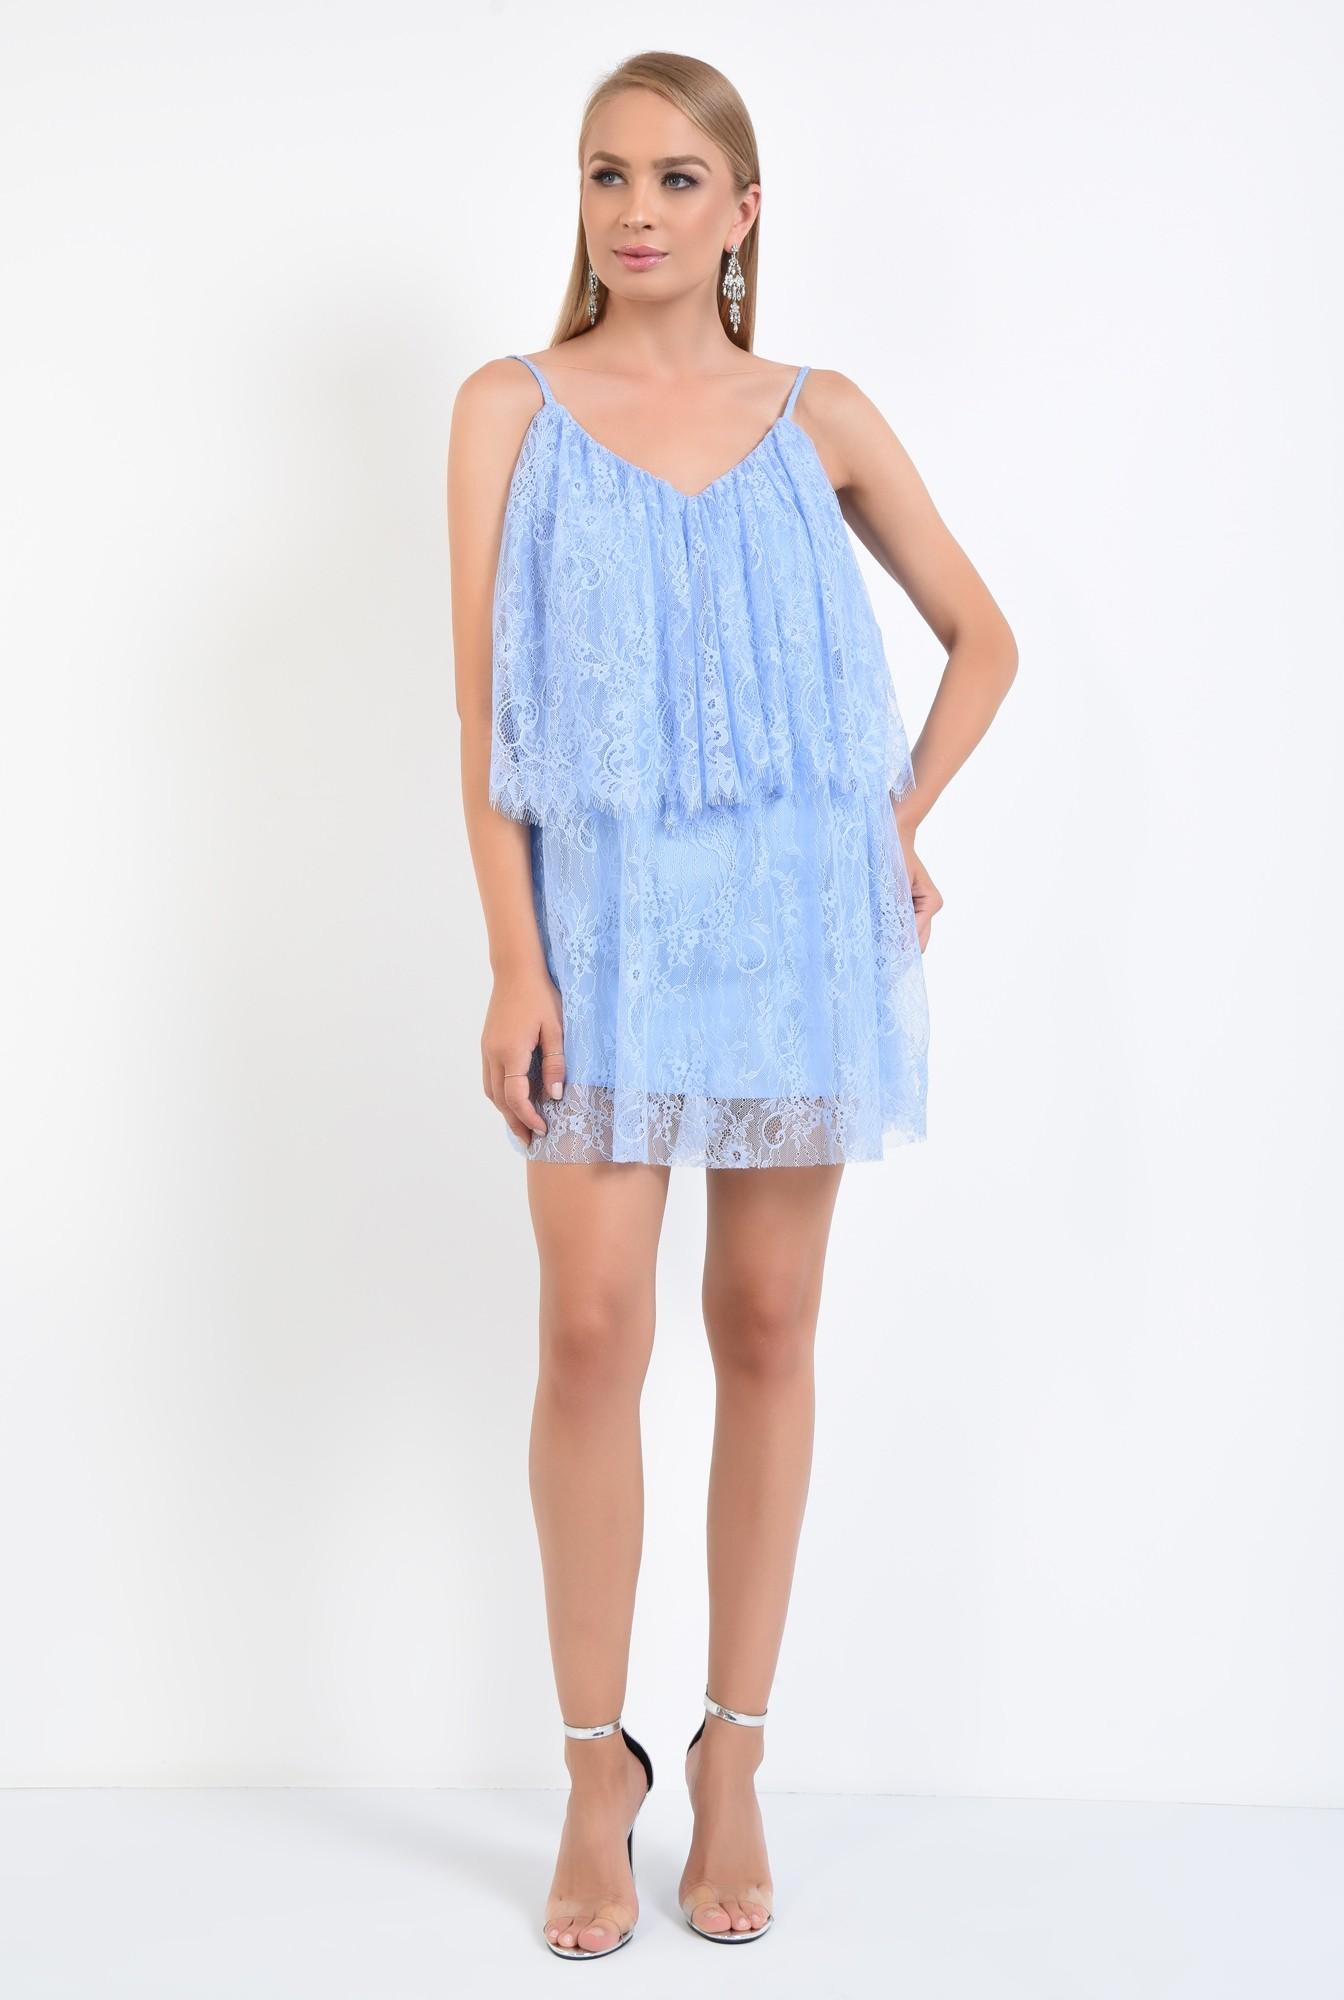 3 - rochie de seara, scurta, din dantela, bleu, cu volan